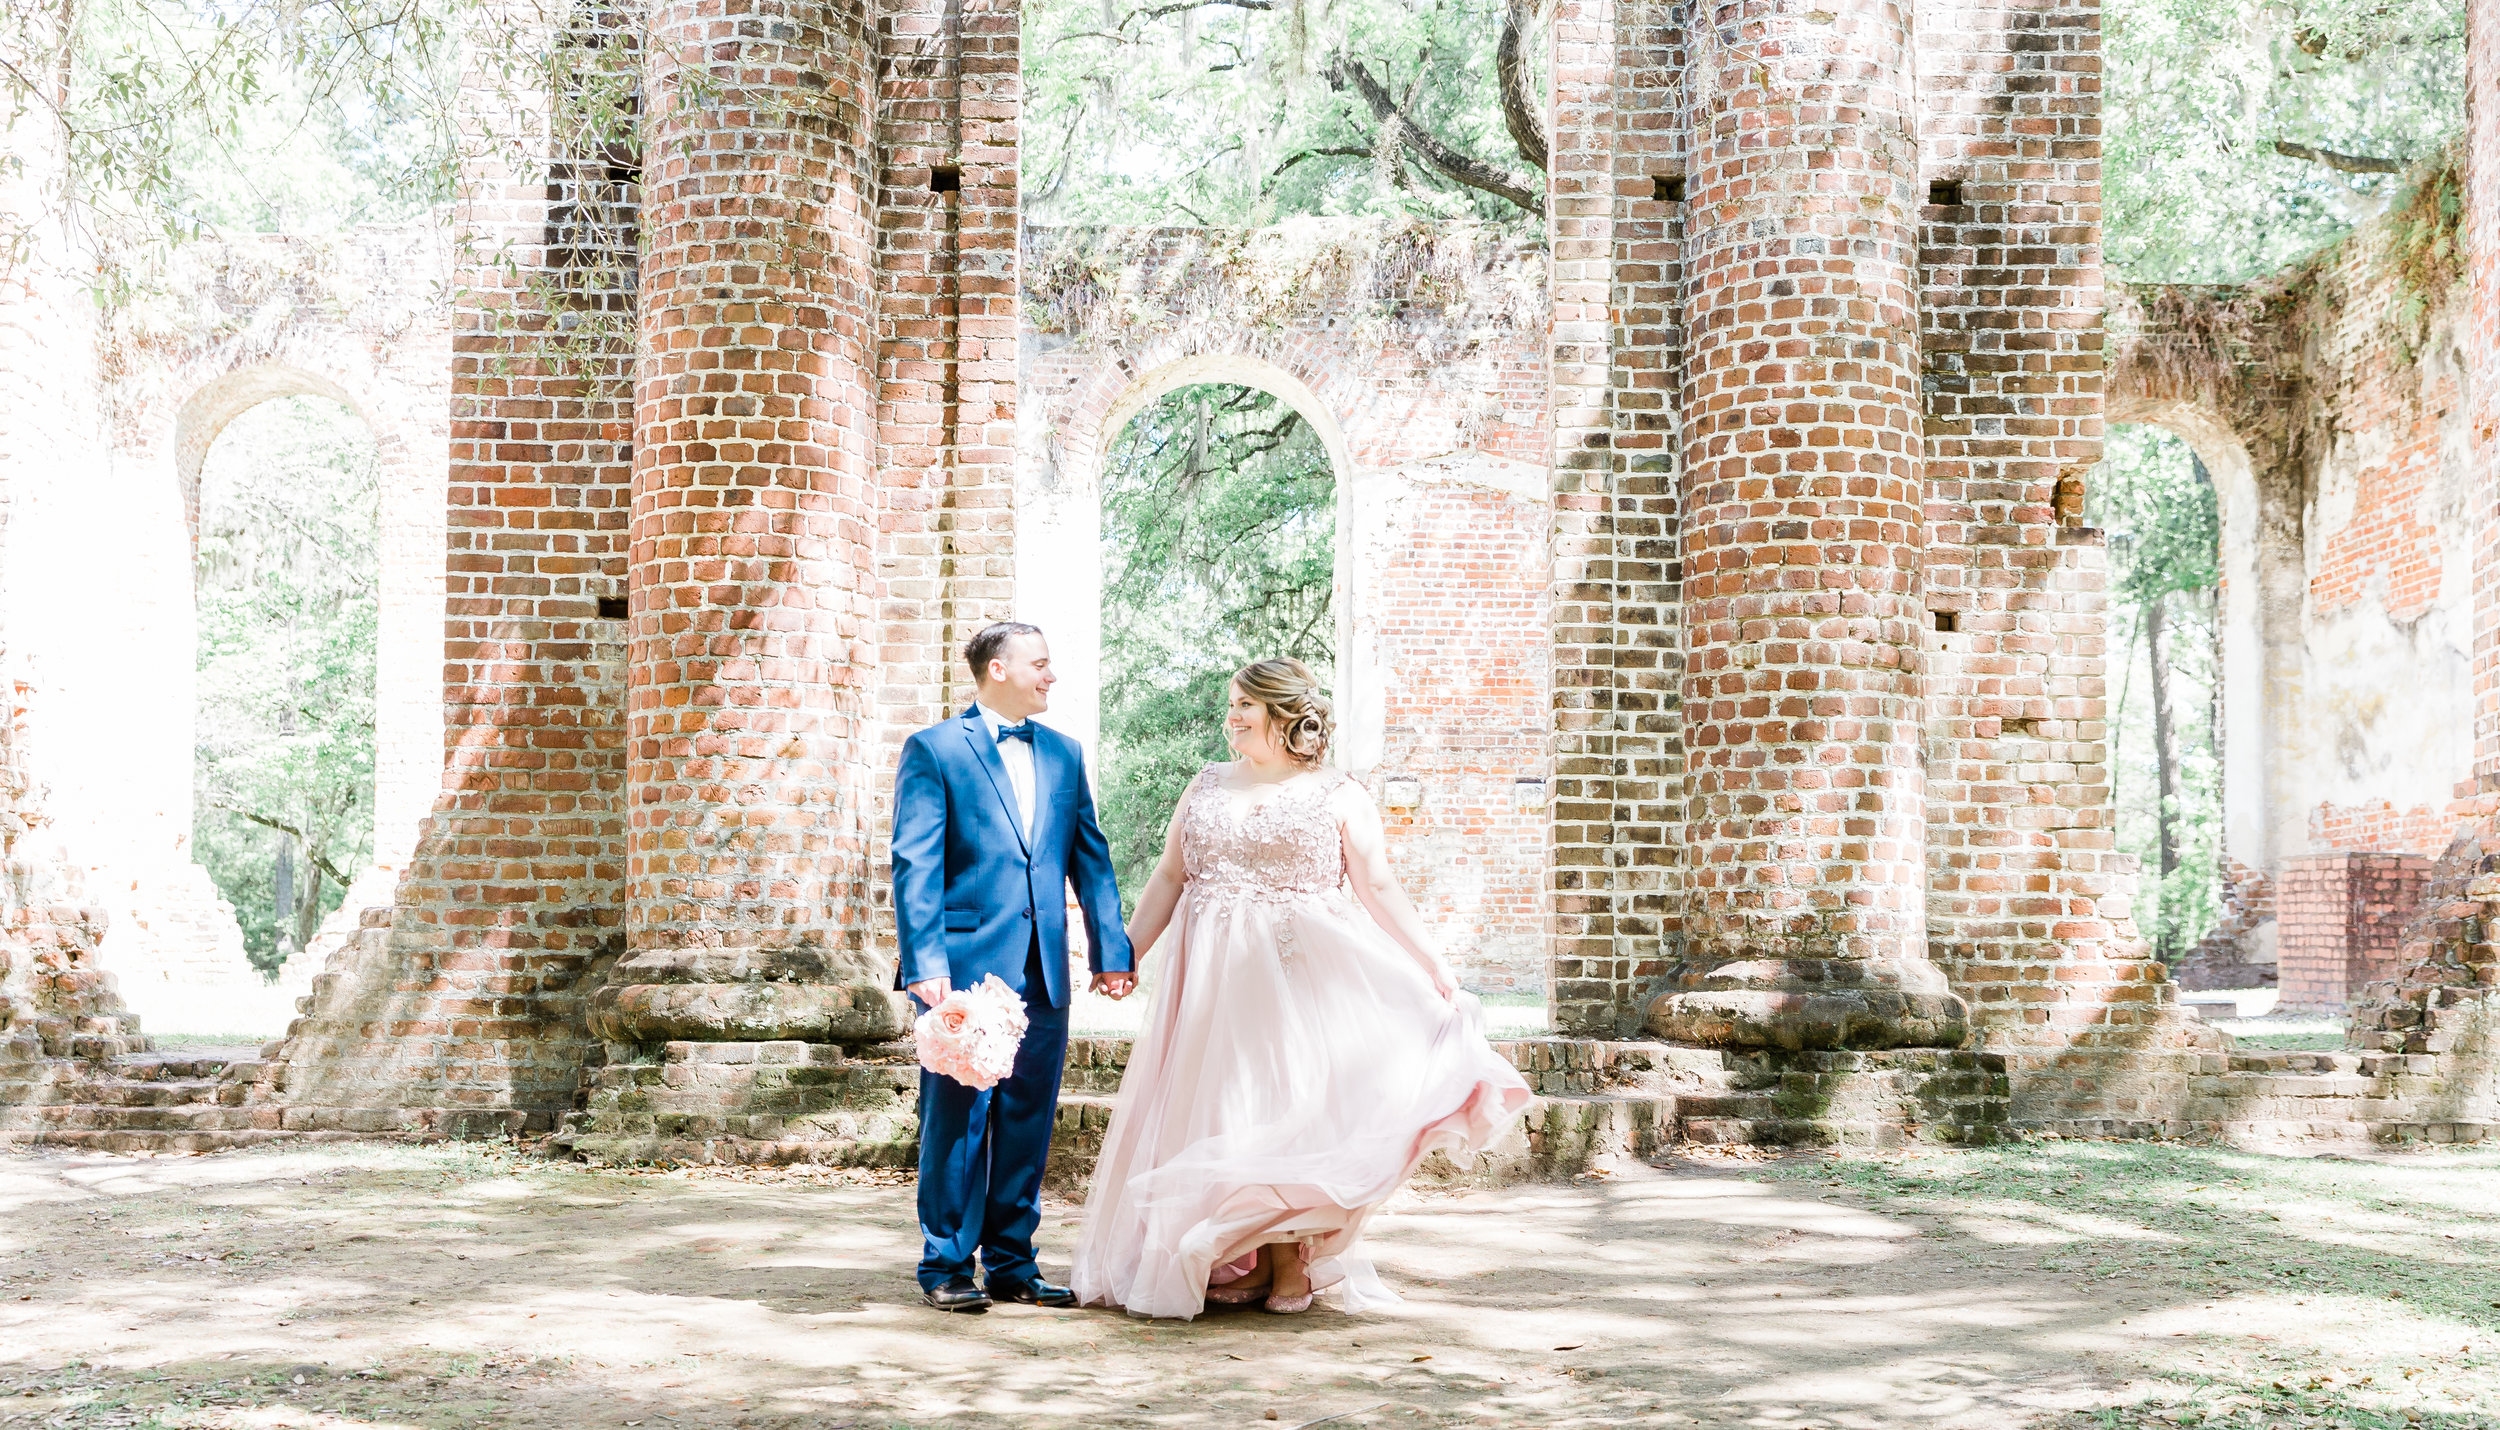 20190417-Southern Lens Photography-savannah family photographer- Ashley and Zack-old sheldon church ruins-201943.jpg